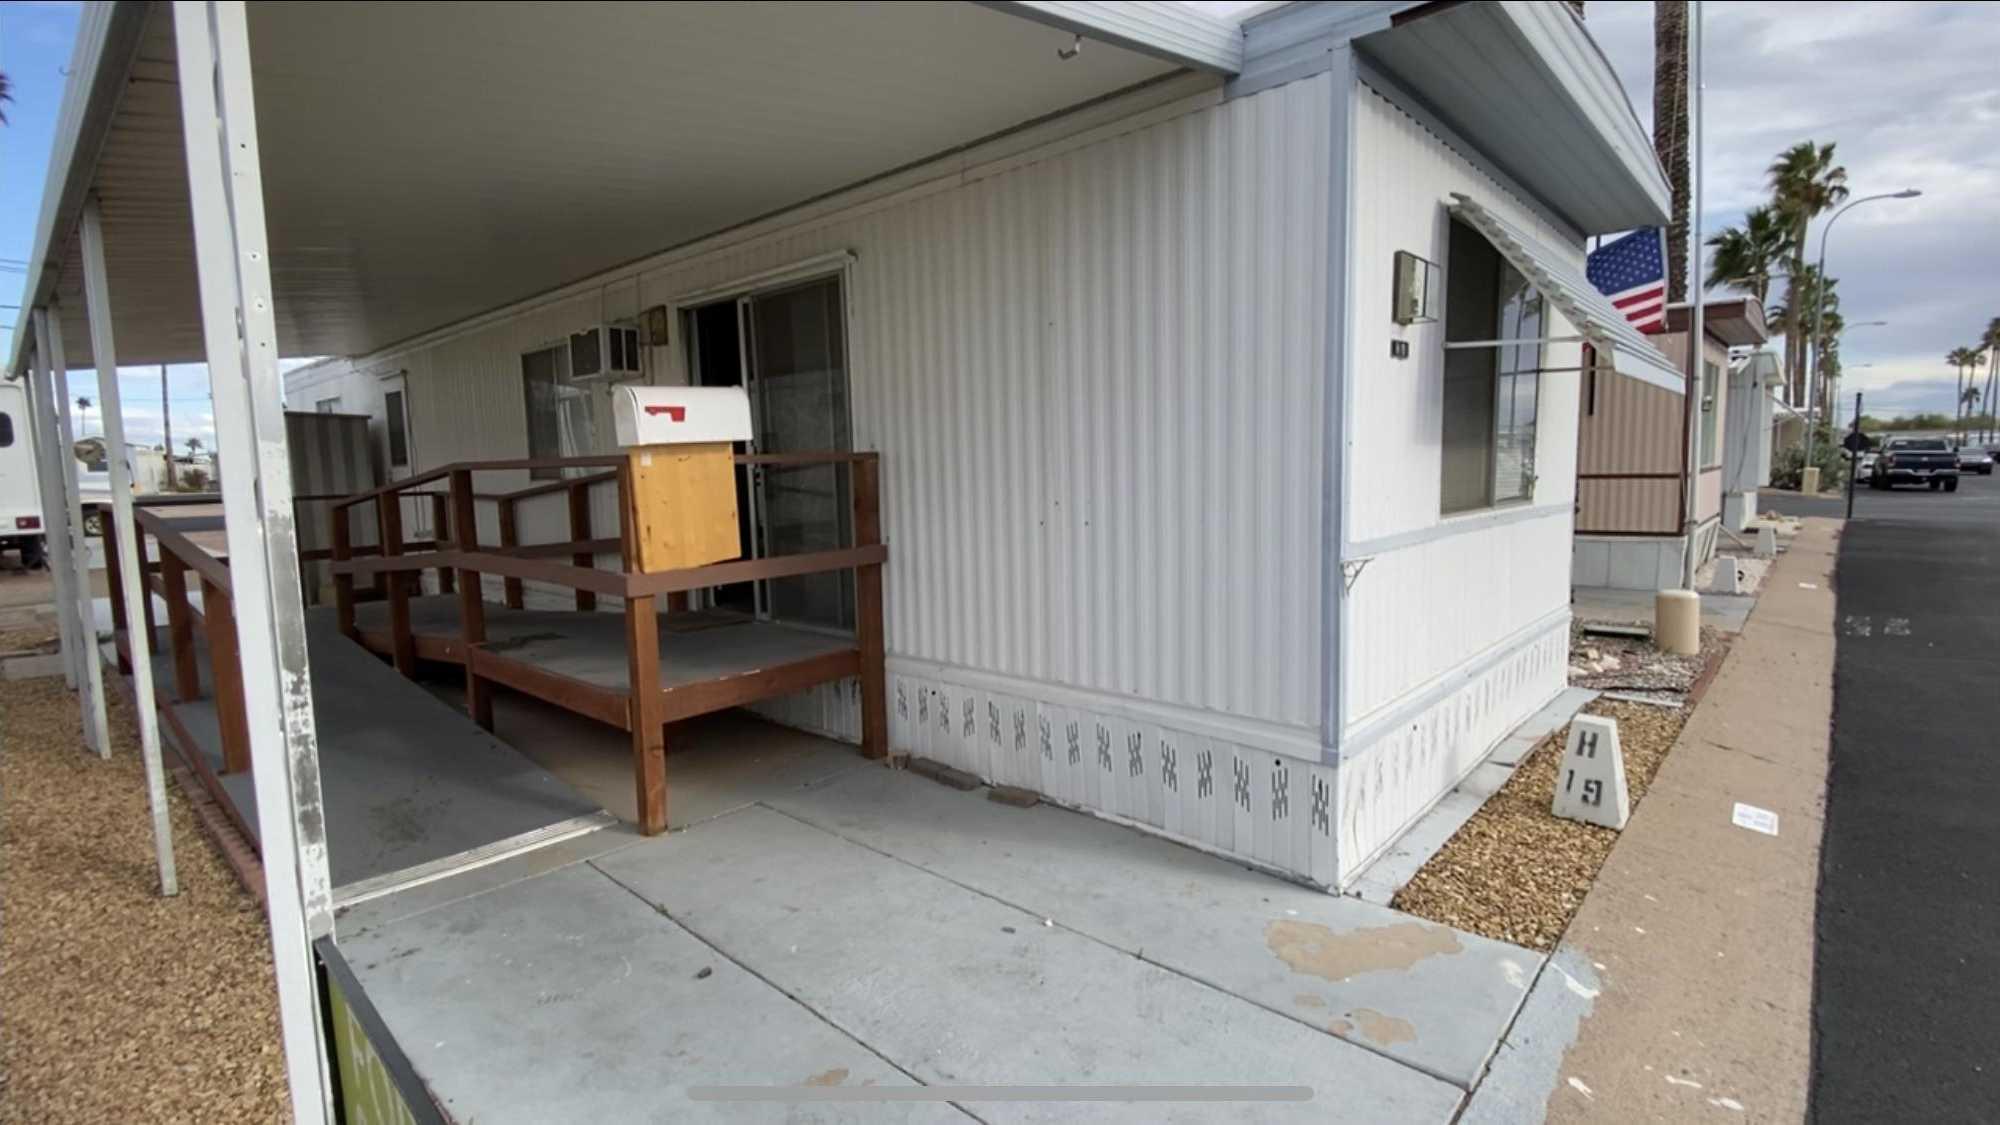 $12,000 - 1Br/1Ba -  for Sale in Agave Village, Mesa